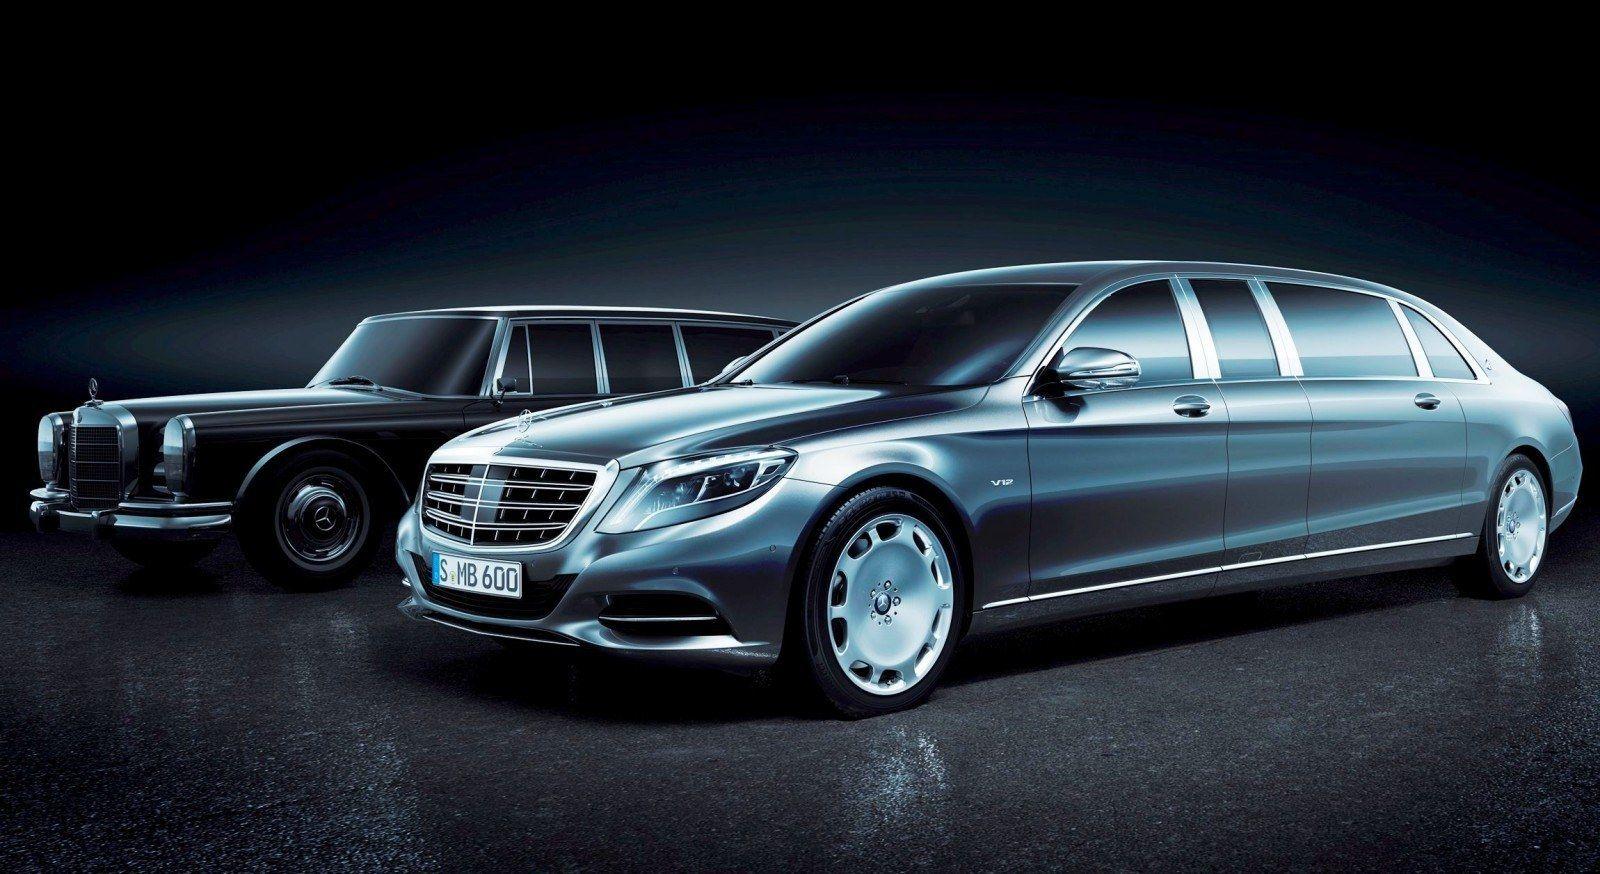 2016 Mercedes Benz Maybach S600 W222 Pullman Limousine Mercedes Benz Maybach Merc Benz Benz